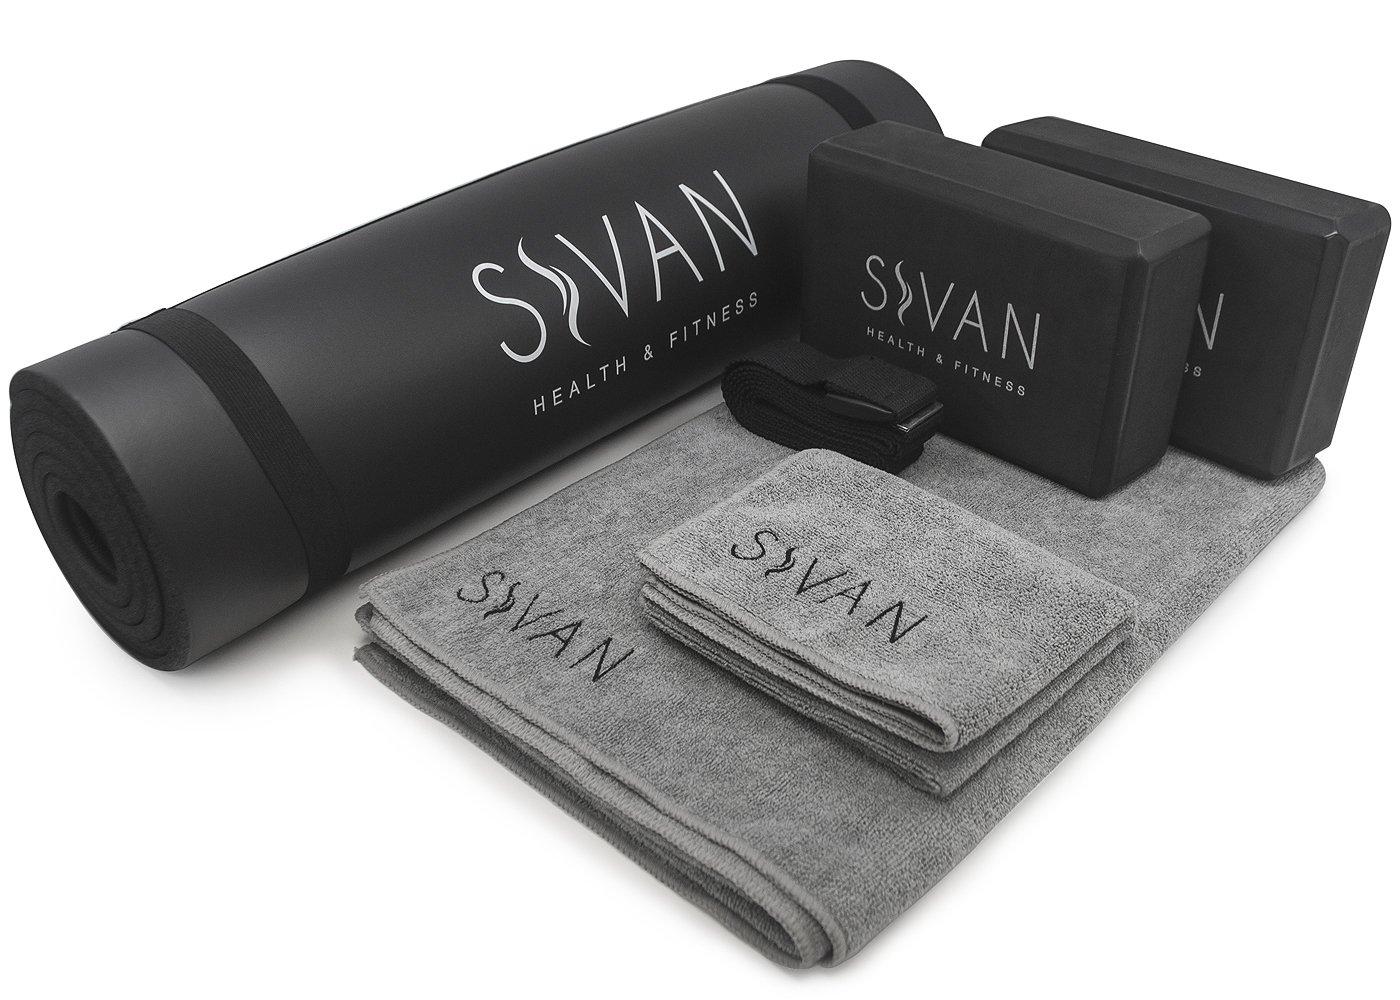 Sivan 6-Piece Yoga Set- Includes 1/2'' Ultra Thick NBR Exercise Mat, 2 Yoga Blocks, 1 Yoga Mat Towel, 1 Yoga Hand Towel and a Yoga Strap (Black)